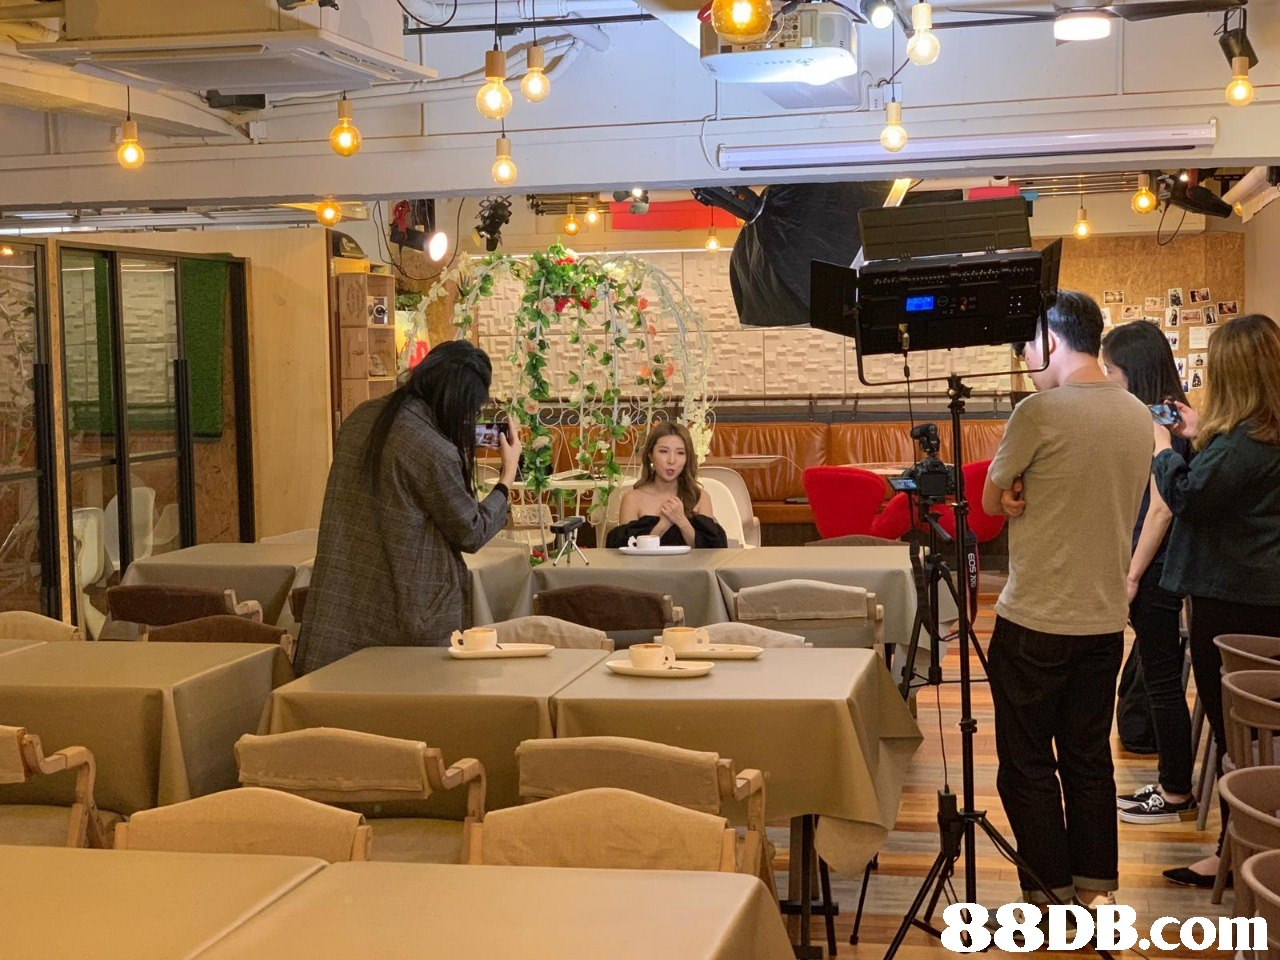 restaurant,function hall,interior design,